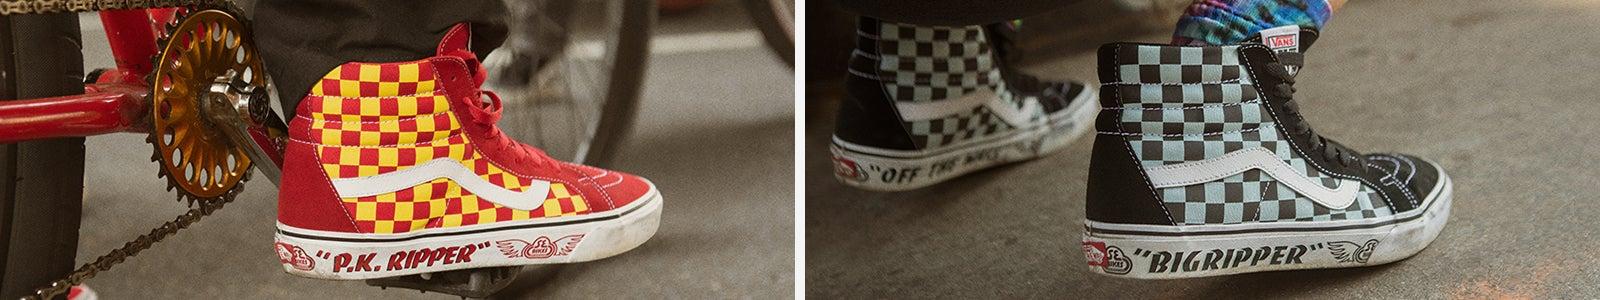 Vans Shoes & Apparel   Foot Locker